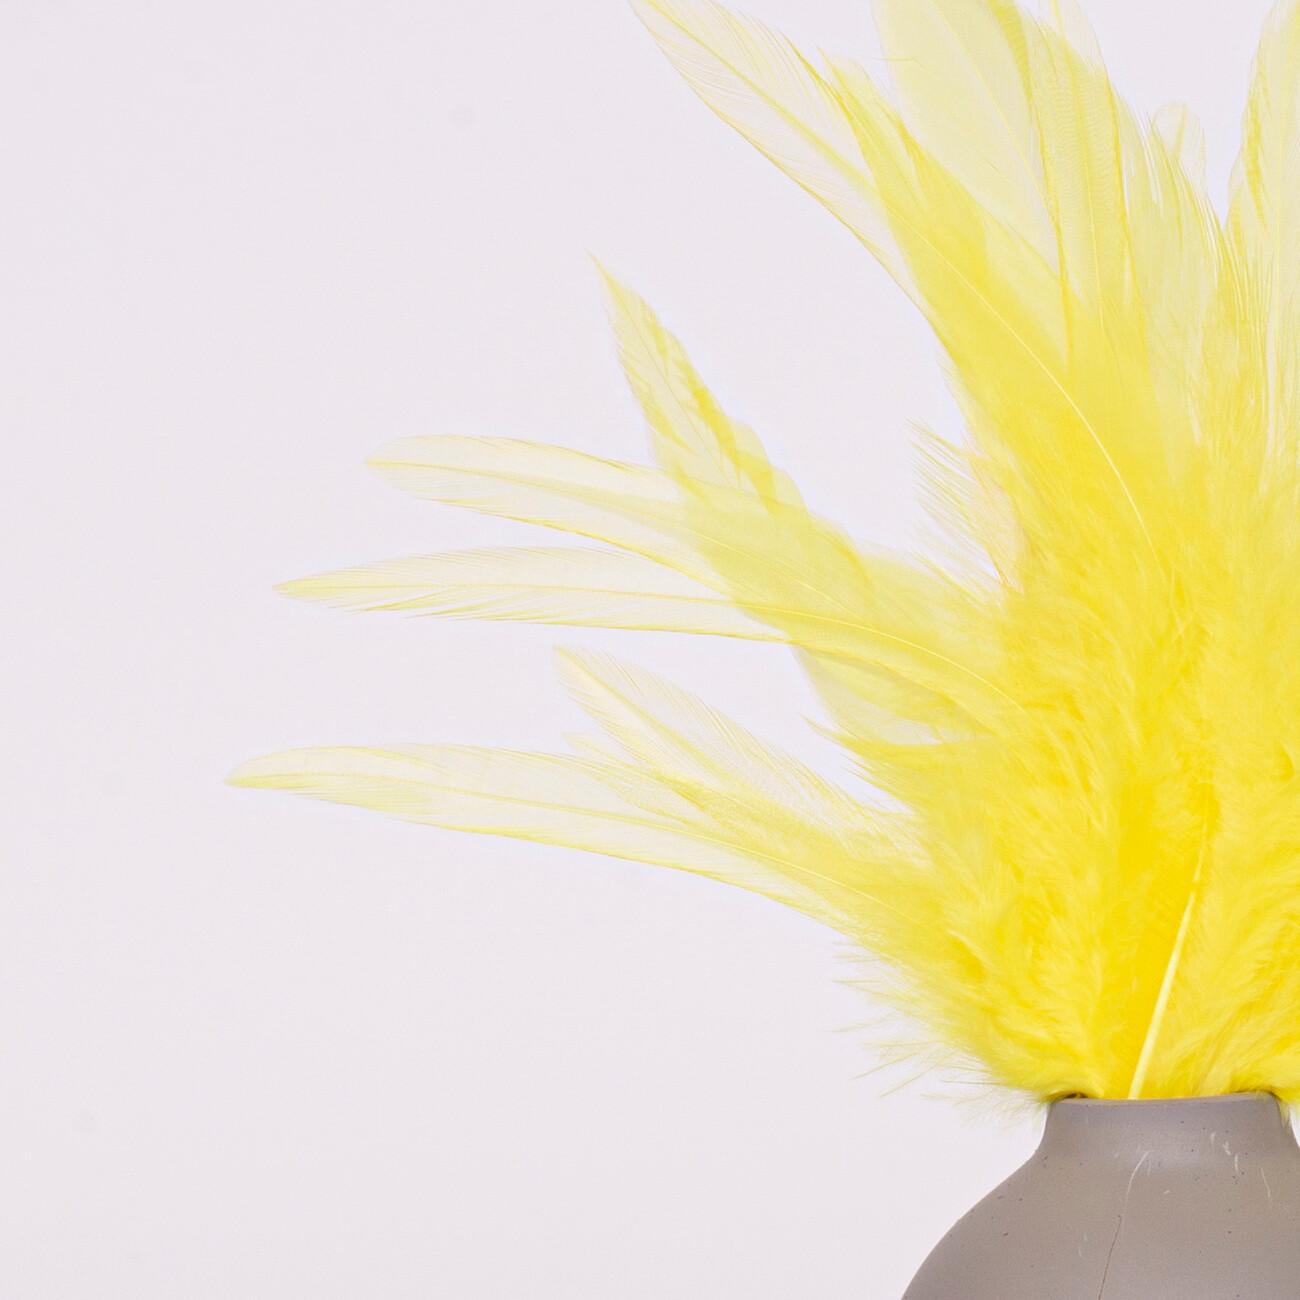 Перья петуха желтые 10 - 15 см. 20 шт.